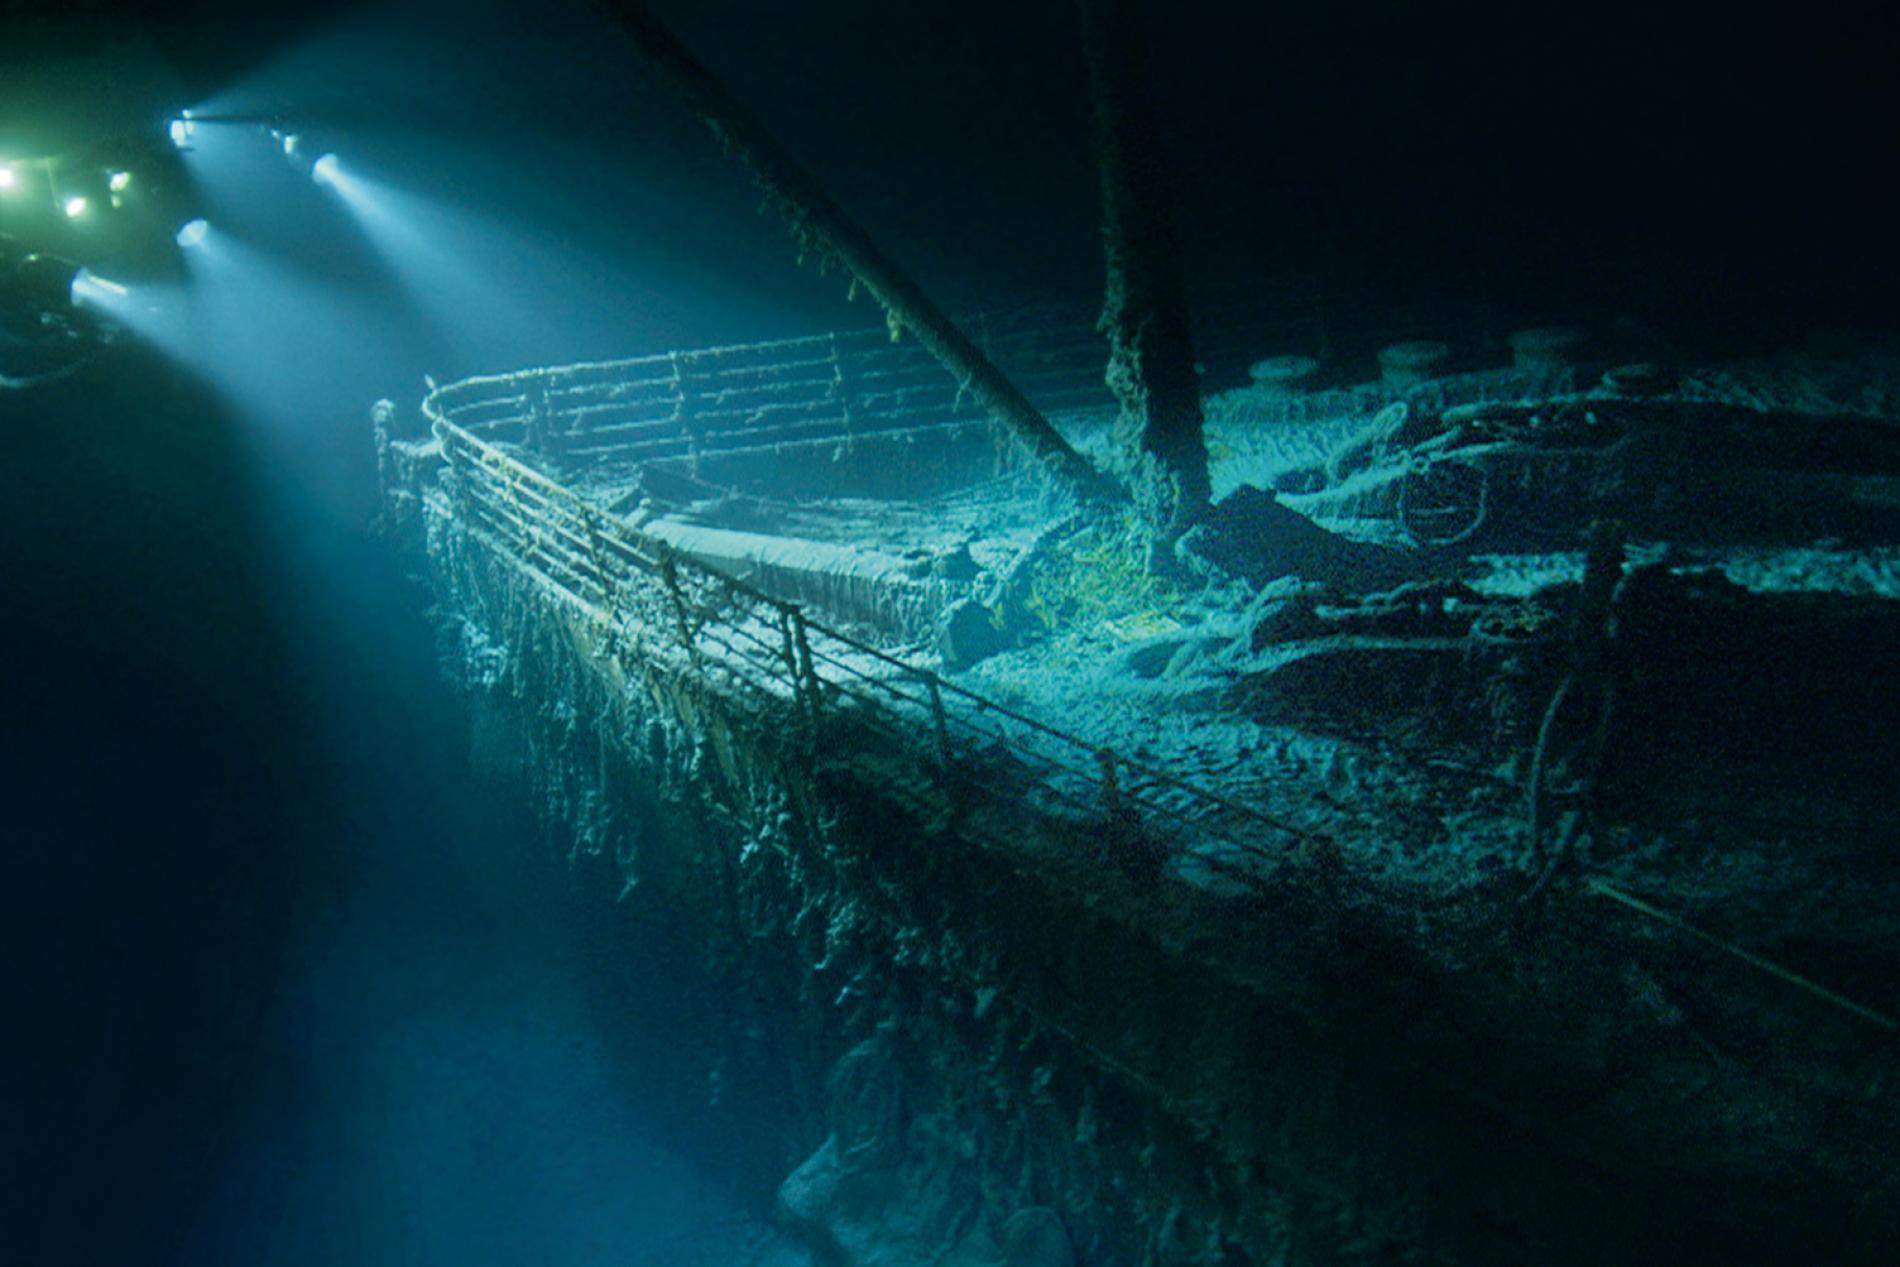 01-port-bow-titanic-3x2.ngsversion.1492030266842.adapt.1900.1.jpg